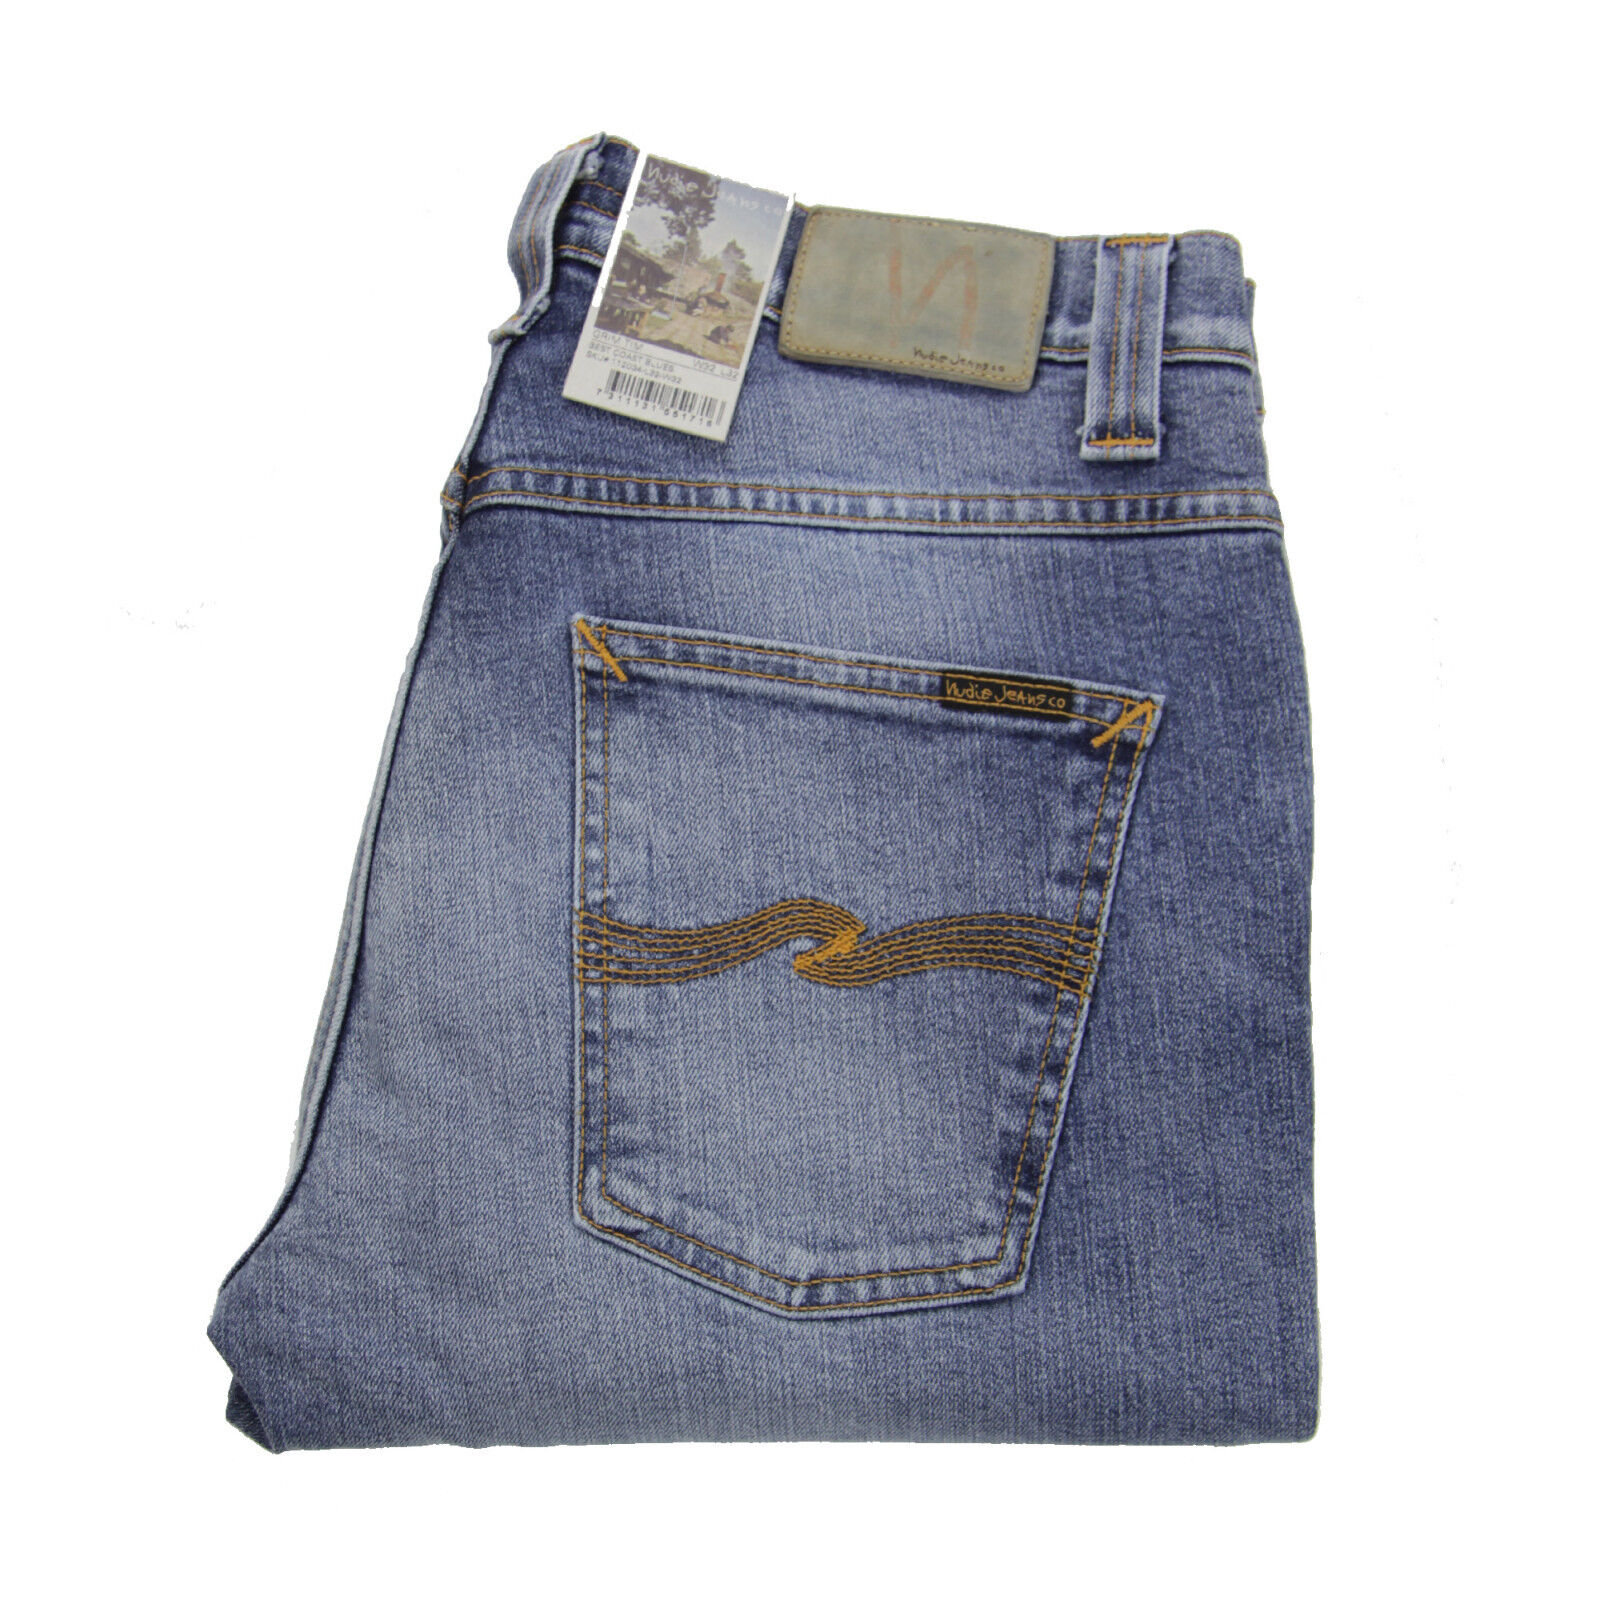 Nudie Grim  tim Jeans, Best Coast azuls, used azul, algodón, 112034, nuevo  los clientes primero